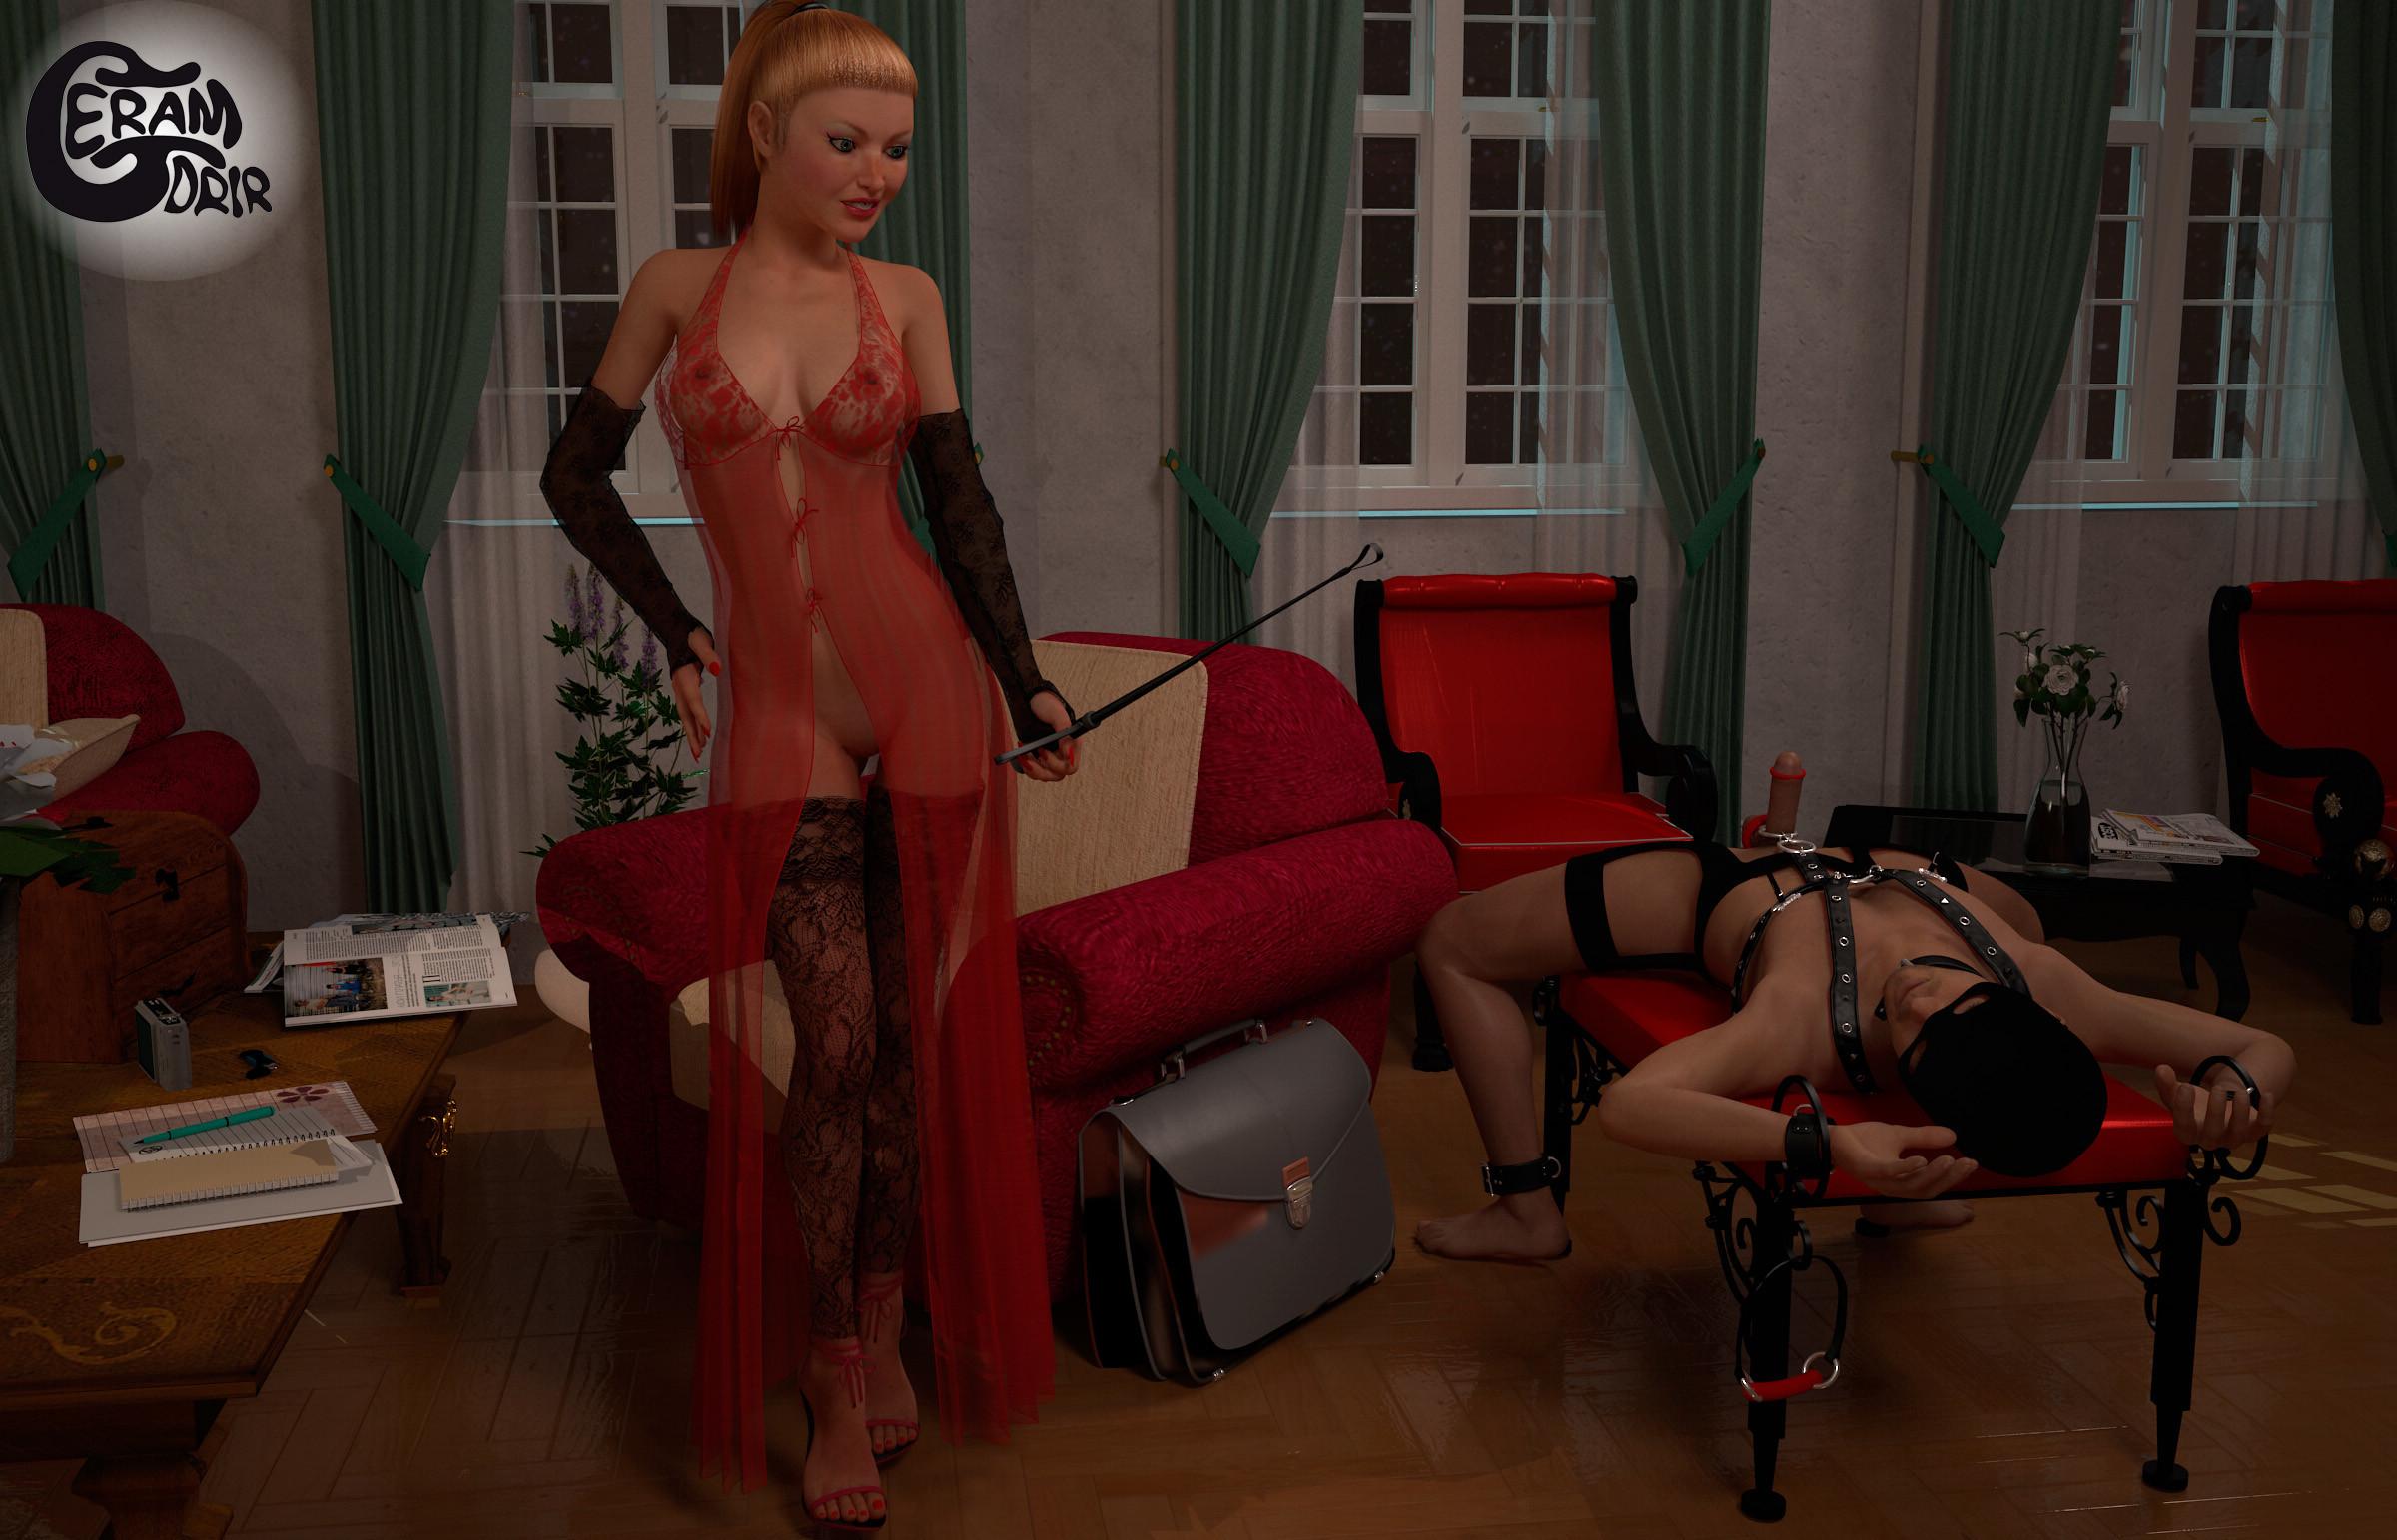 orgy sex parties 1